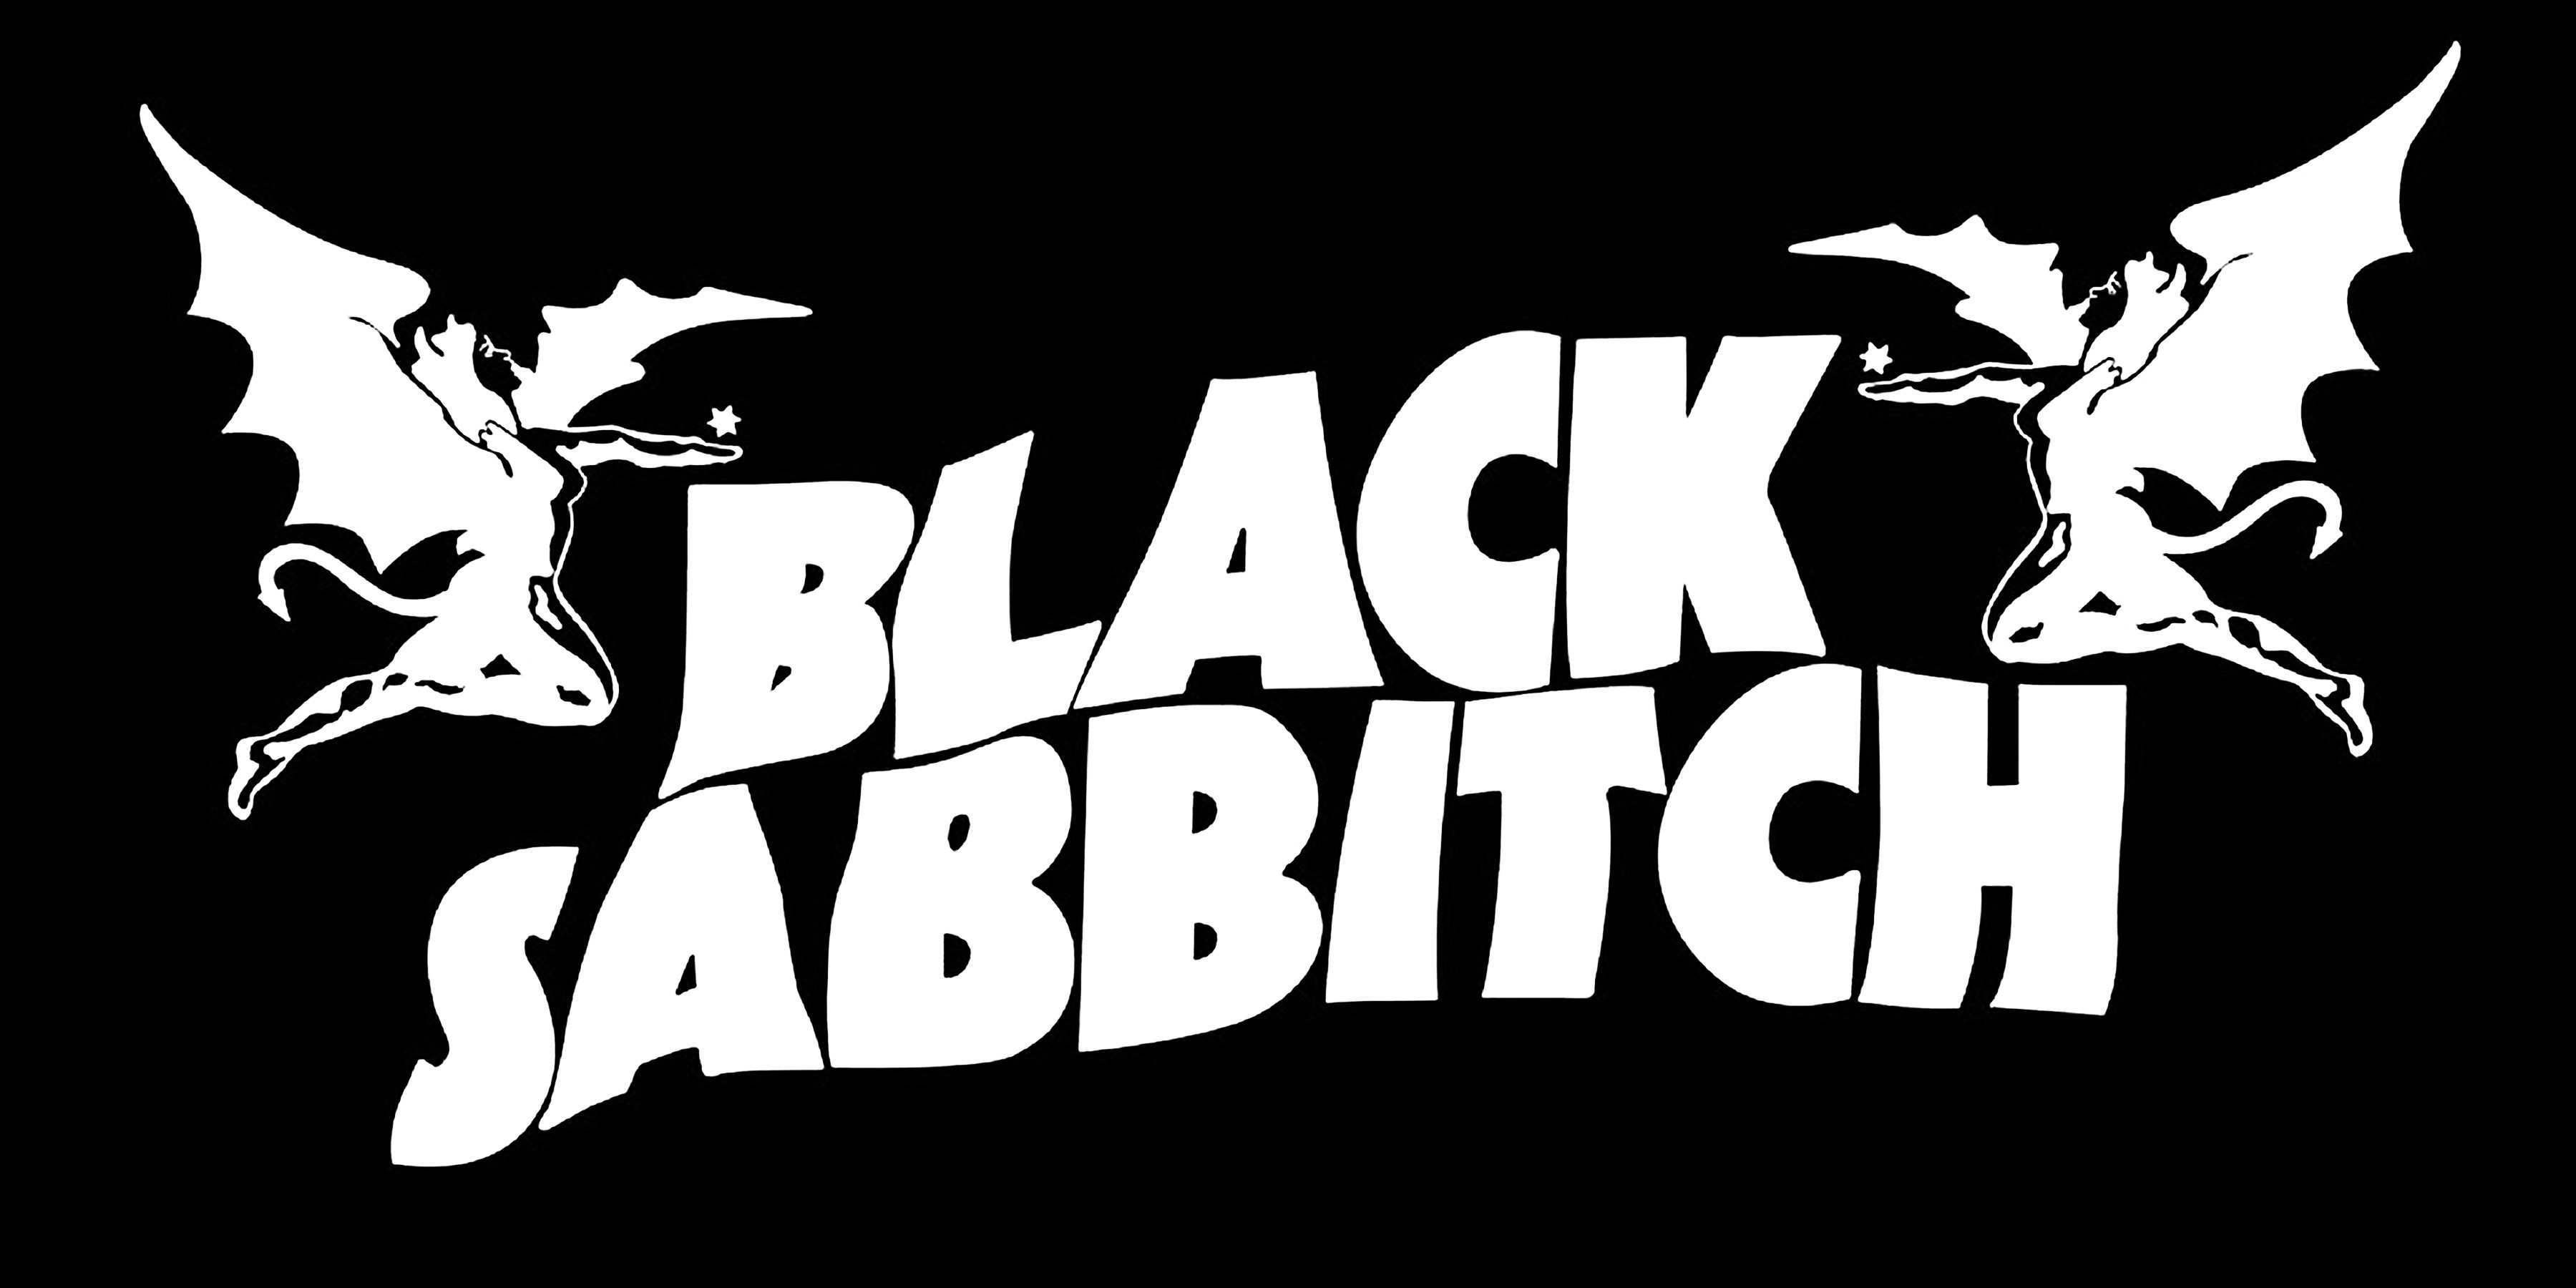 black sabbath wallpaper for large desktop by Clarissa Brook (2016-01-02)